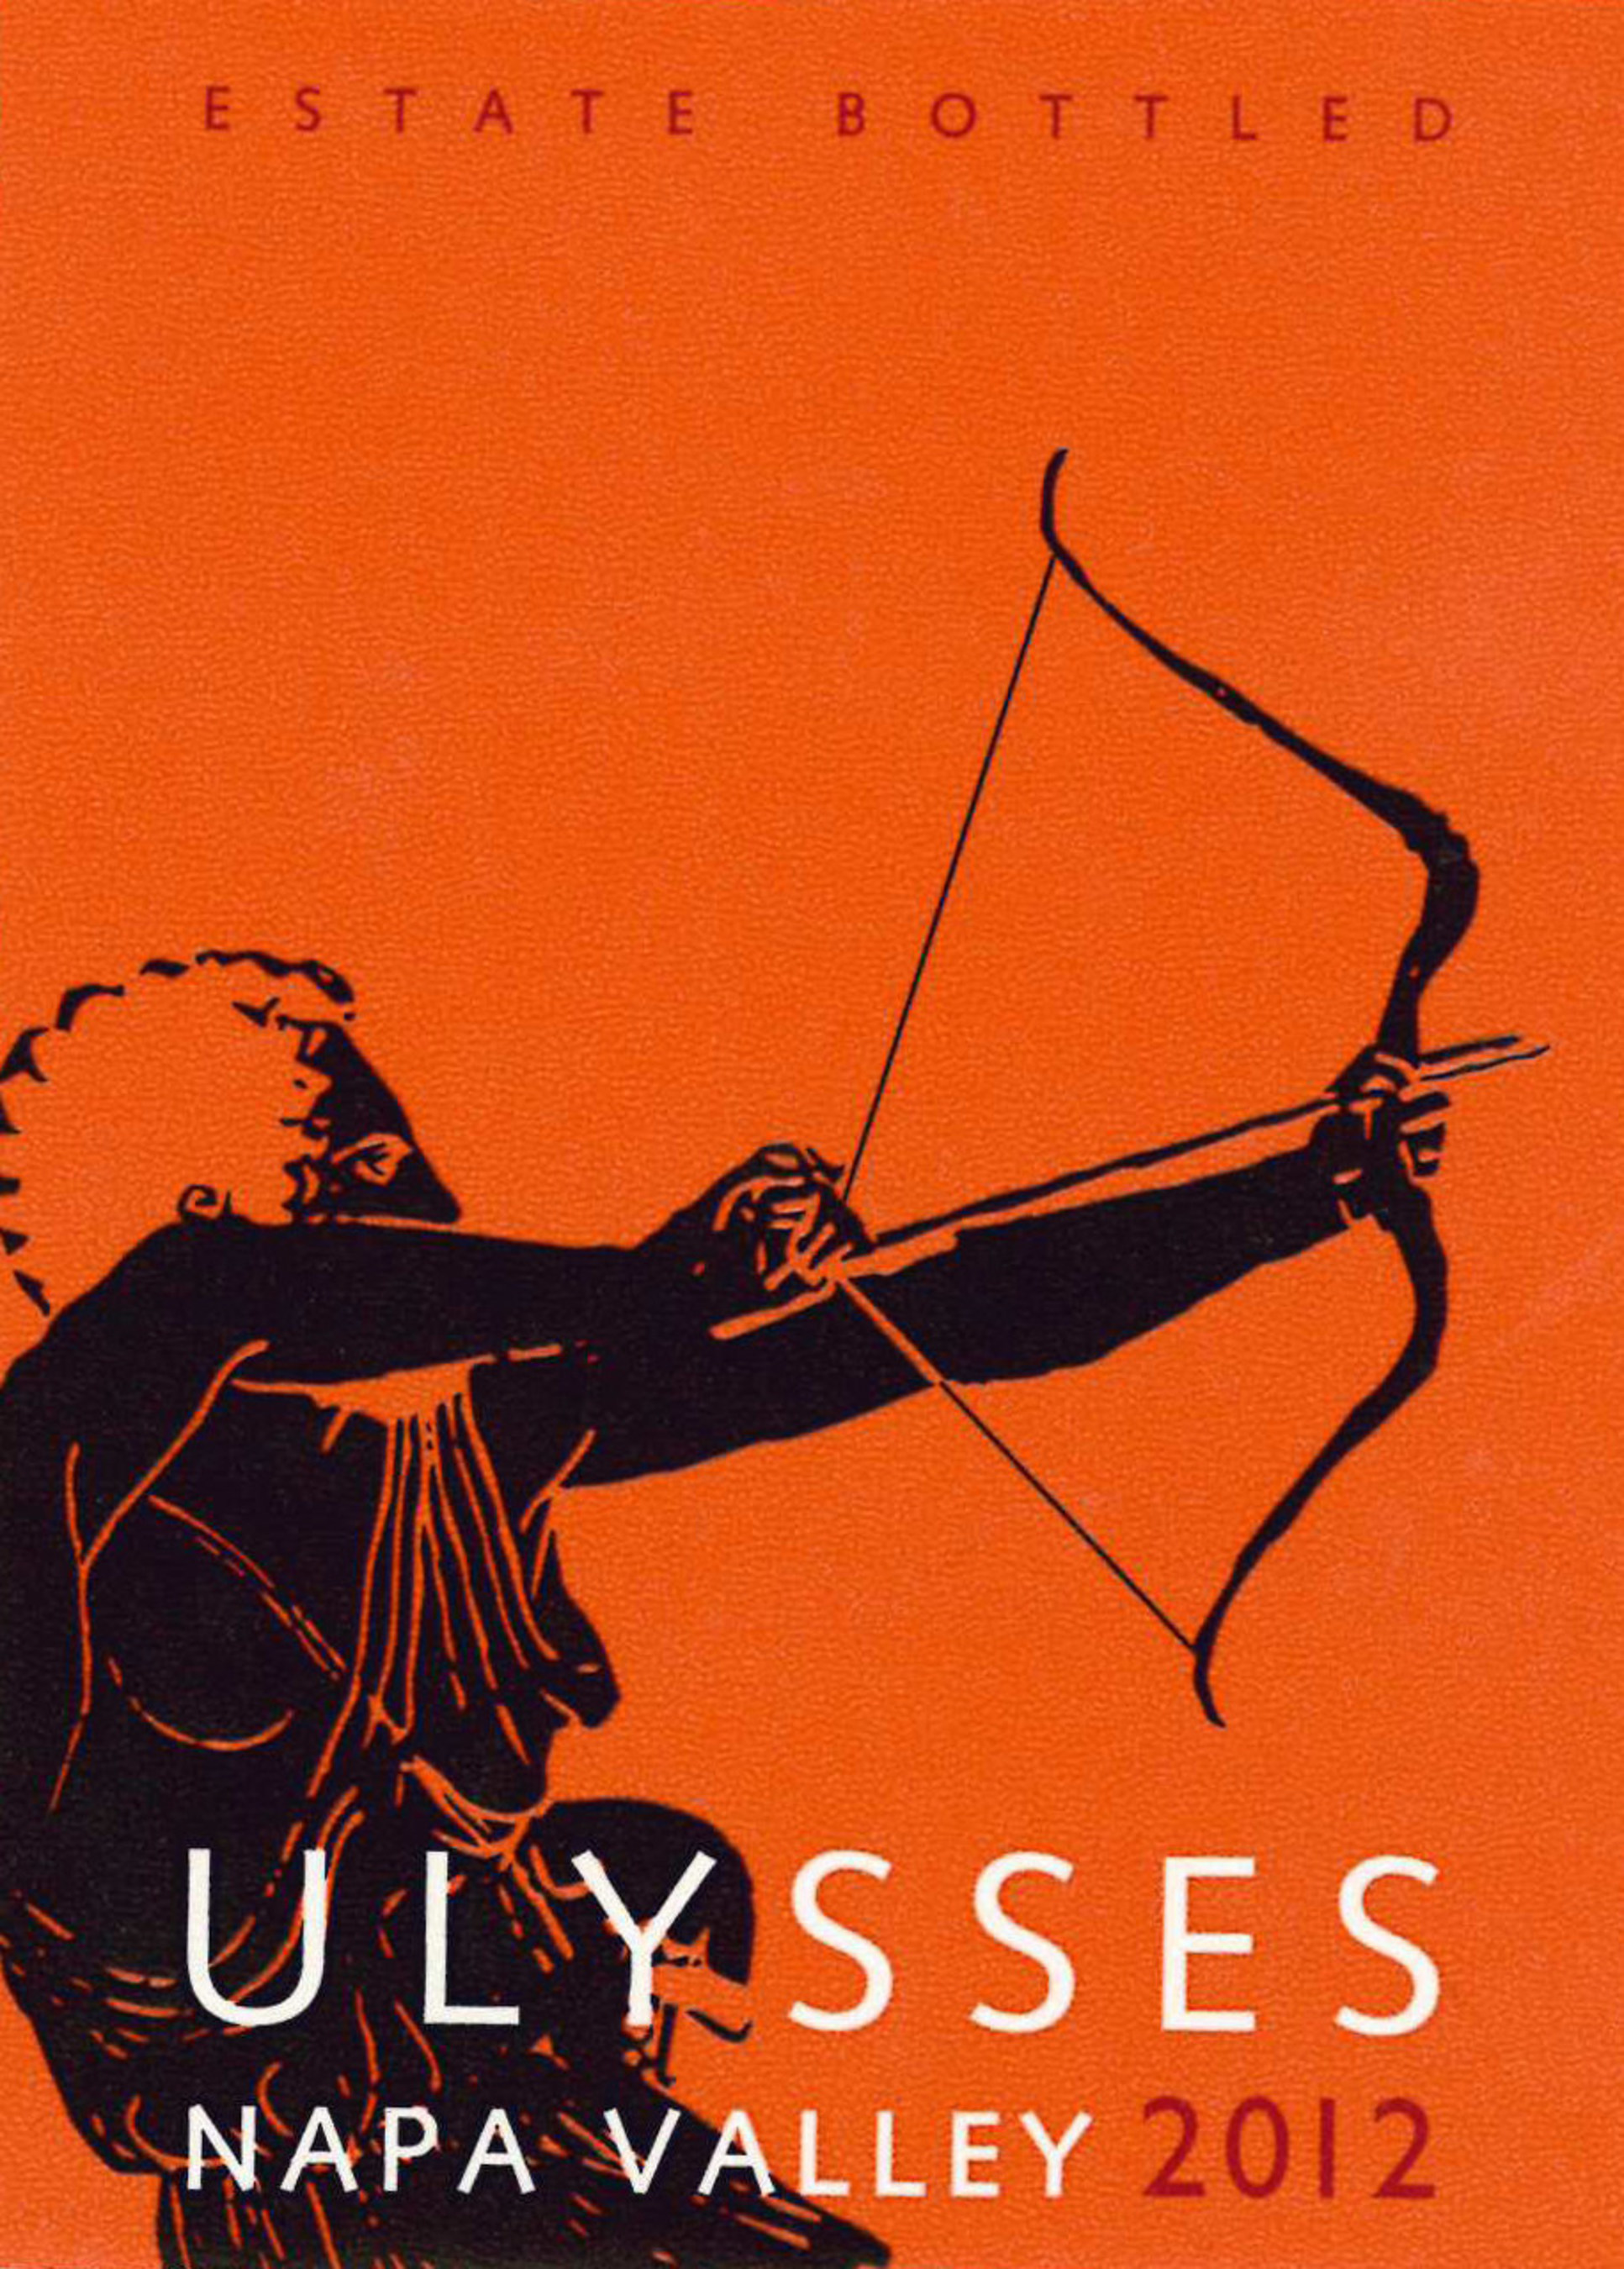 Ulysses 2012 Wine Label